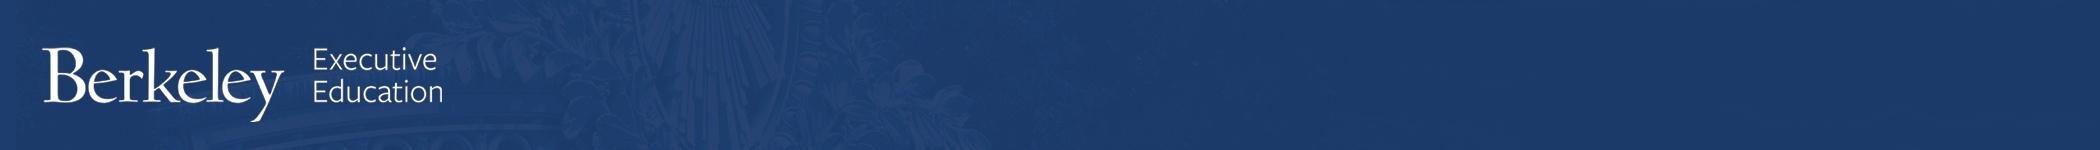 PAGE HEADER - New Logo Small.jpg